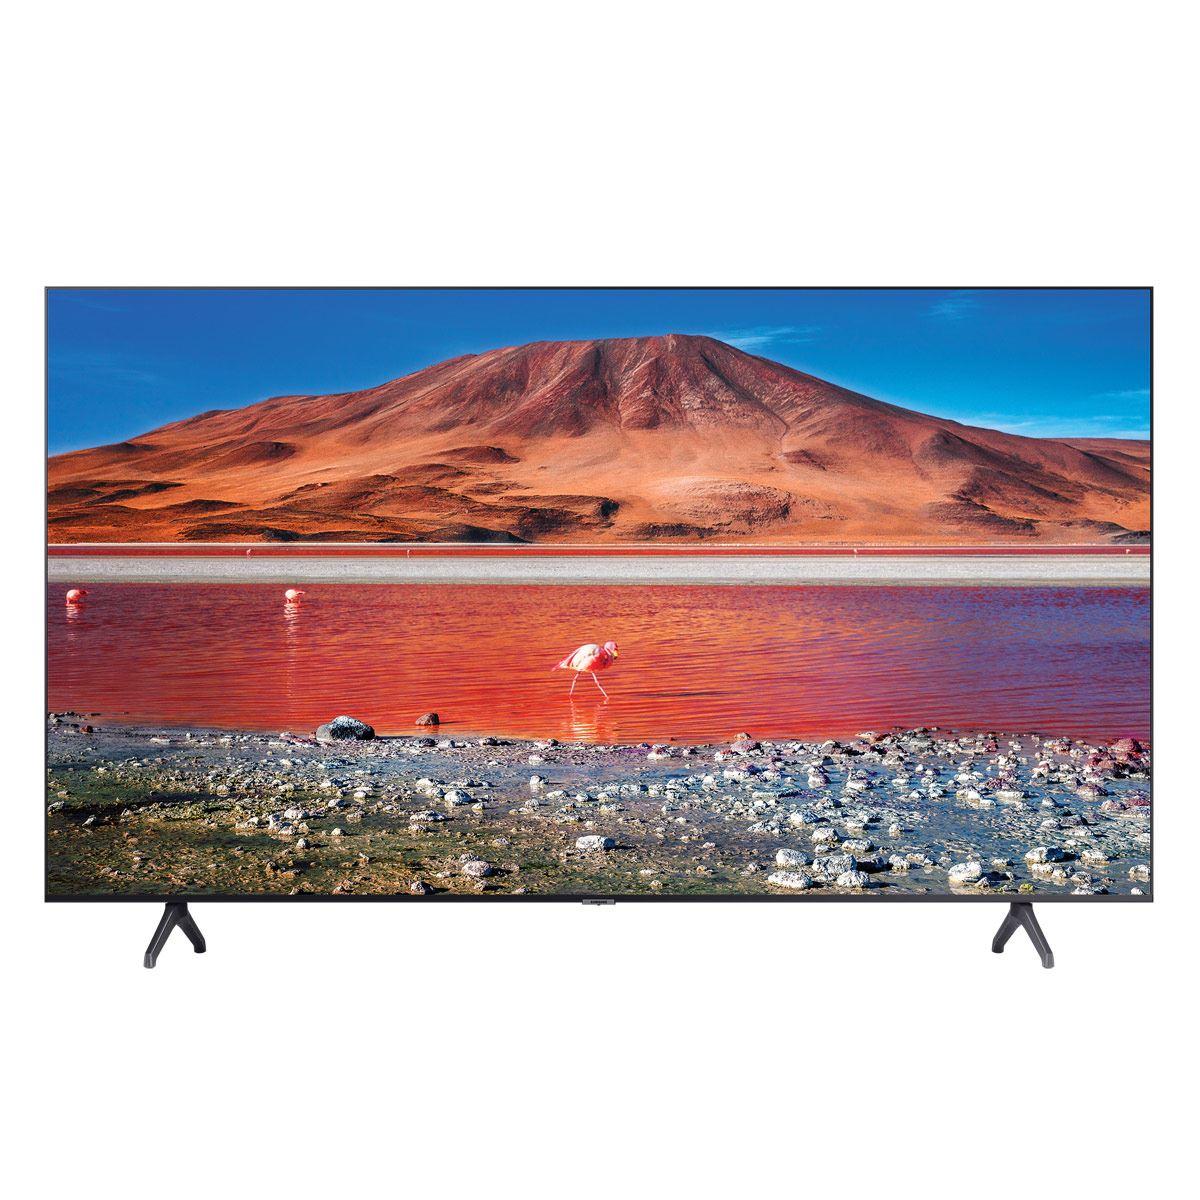 "Sanborns: Samsung UN43TU7000FXZX 43"" Crystal UHD 4K"